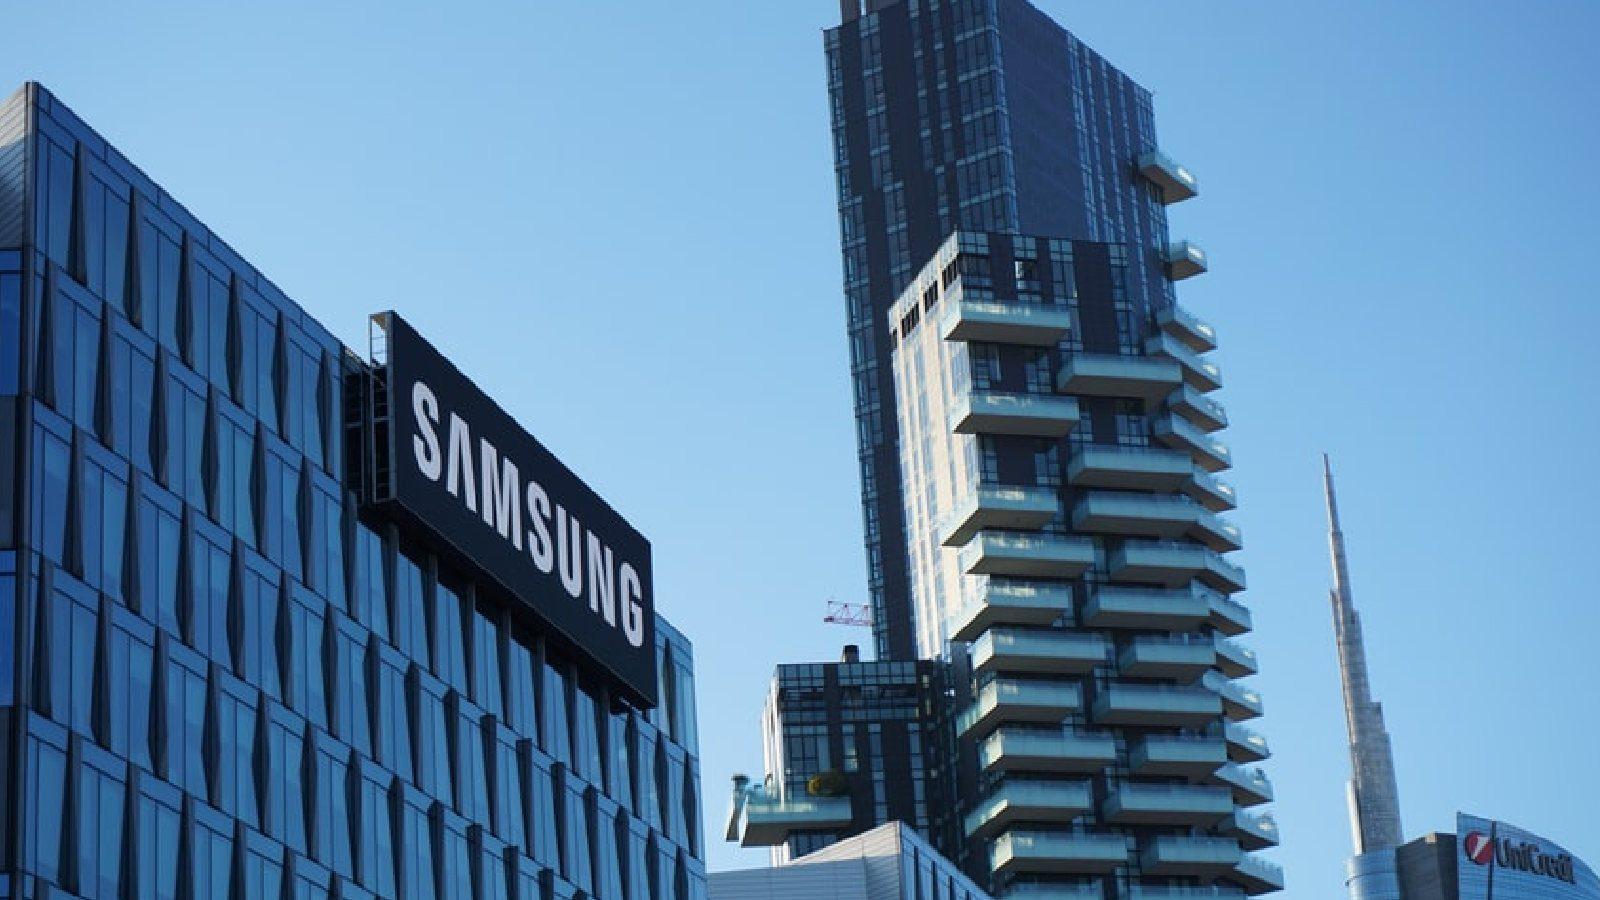 Samsung Logo on building